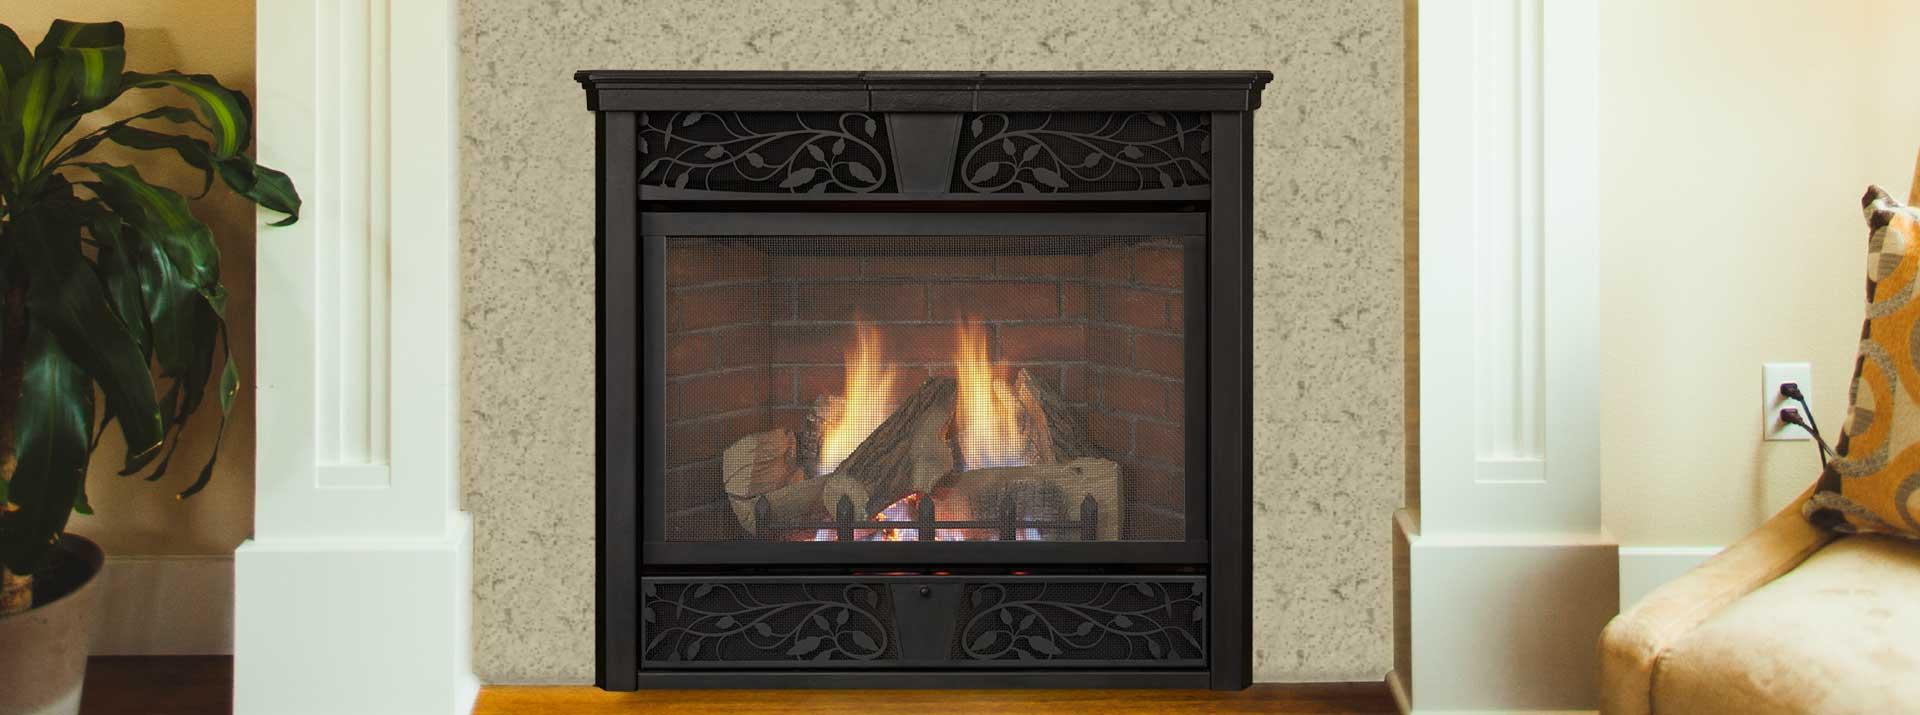 symphony vent free gas fireplace monessen hearth rh monessenhearth com Natural Gas Fireplace Vented Gas Fireplace Inserts